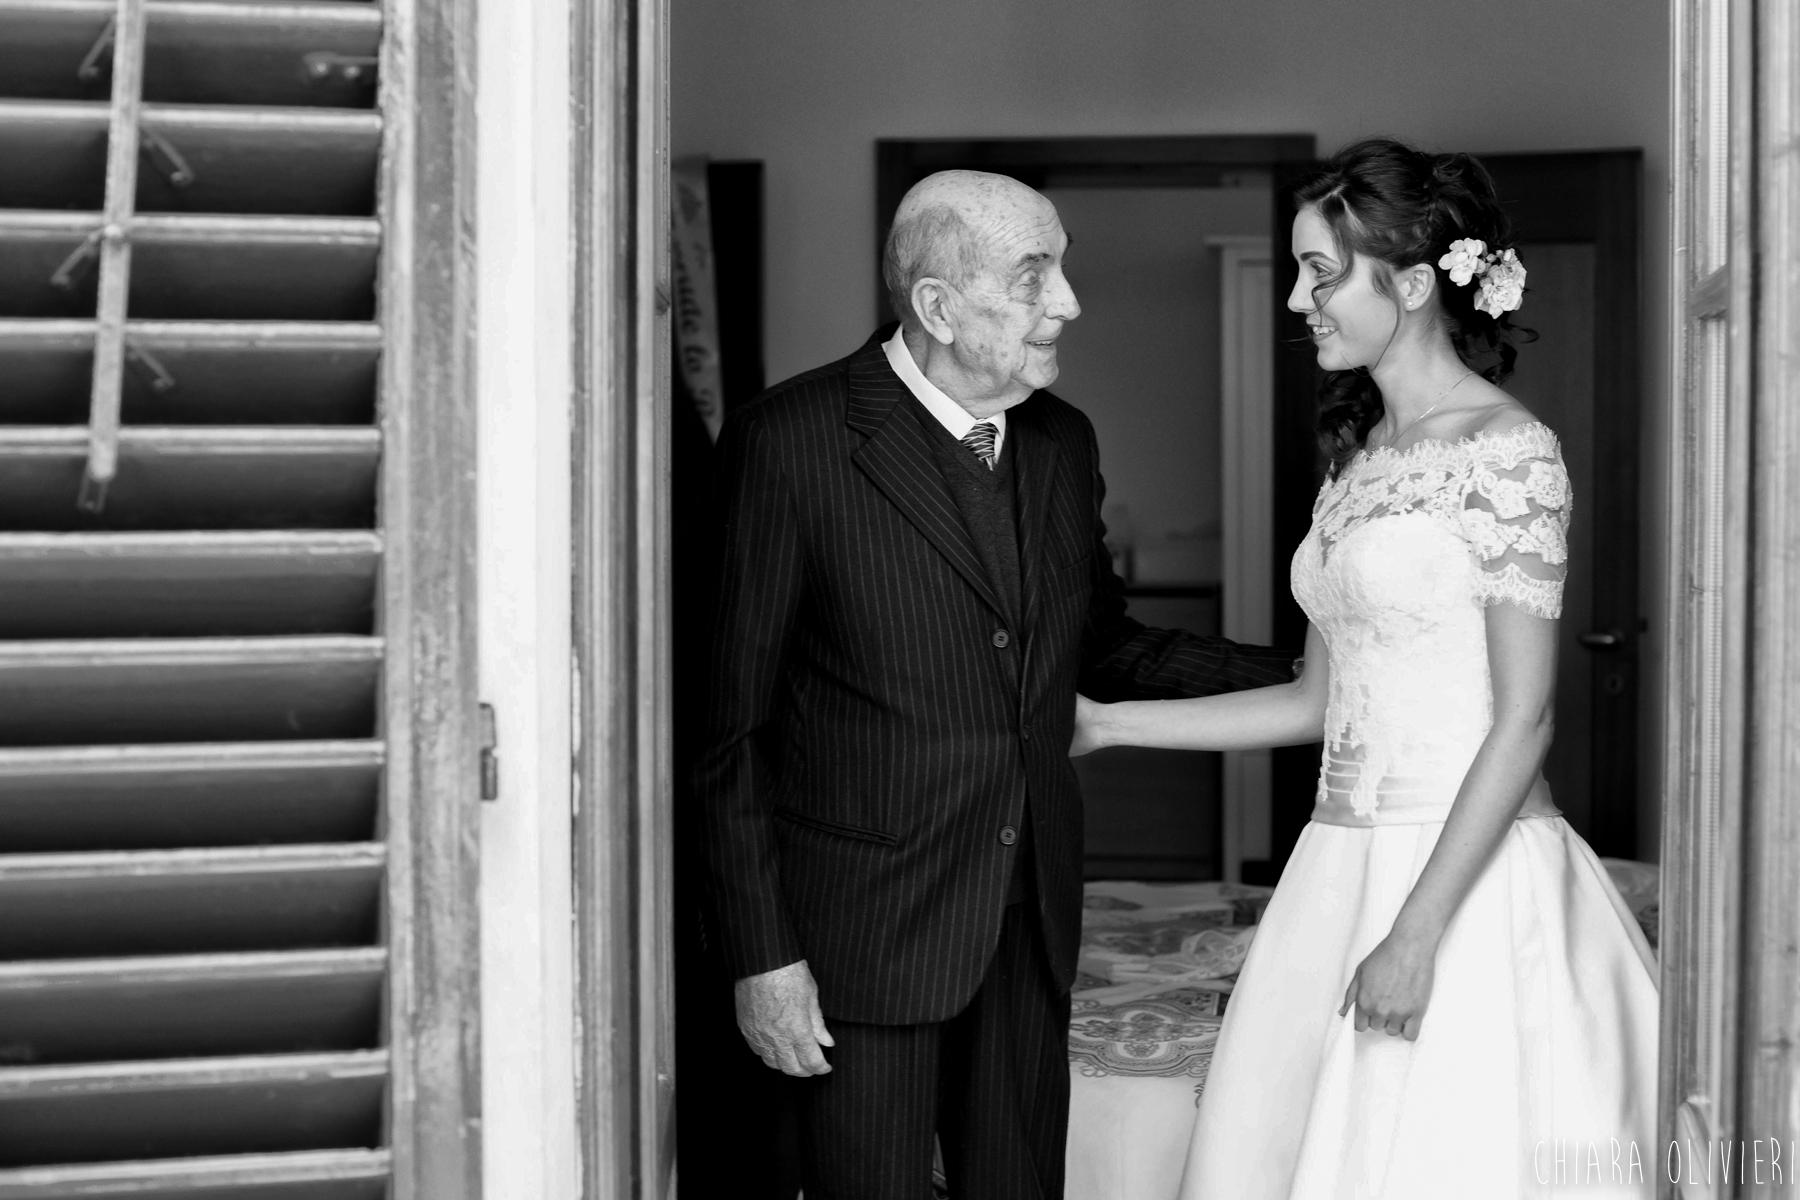 wedding-photographer-reportage-scattidamore-italy-35